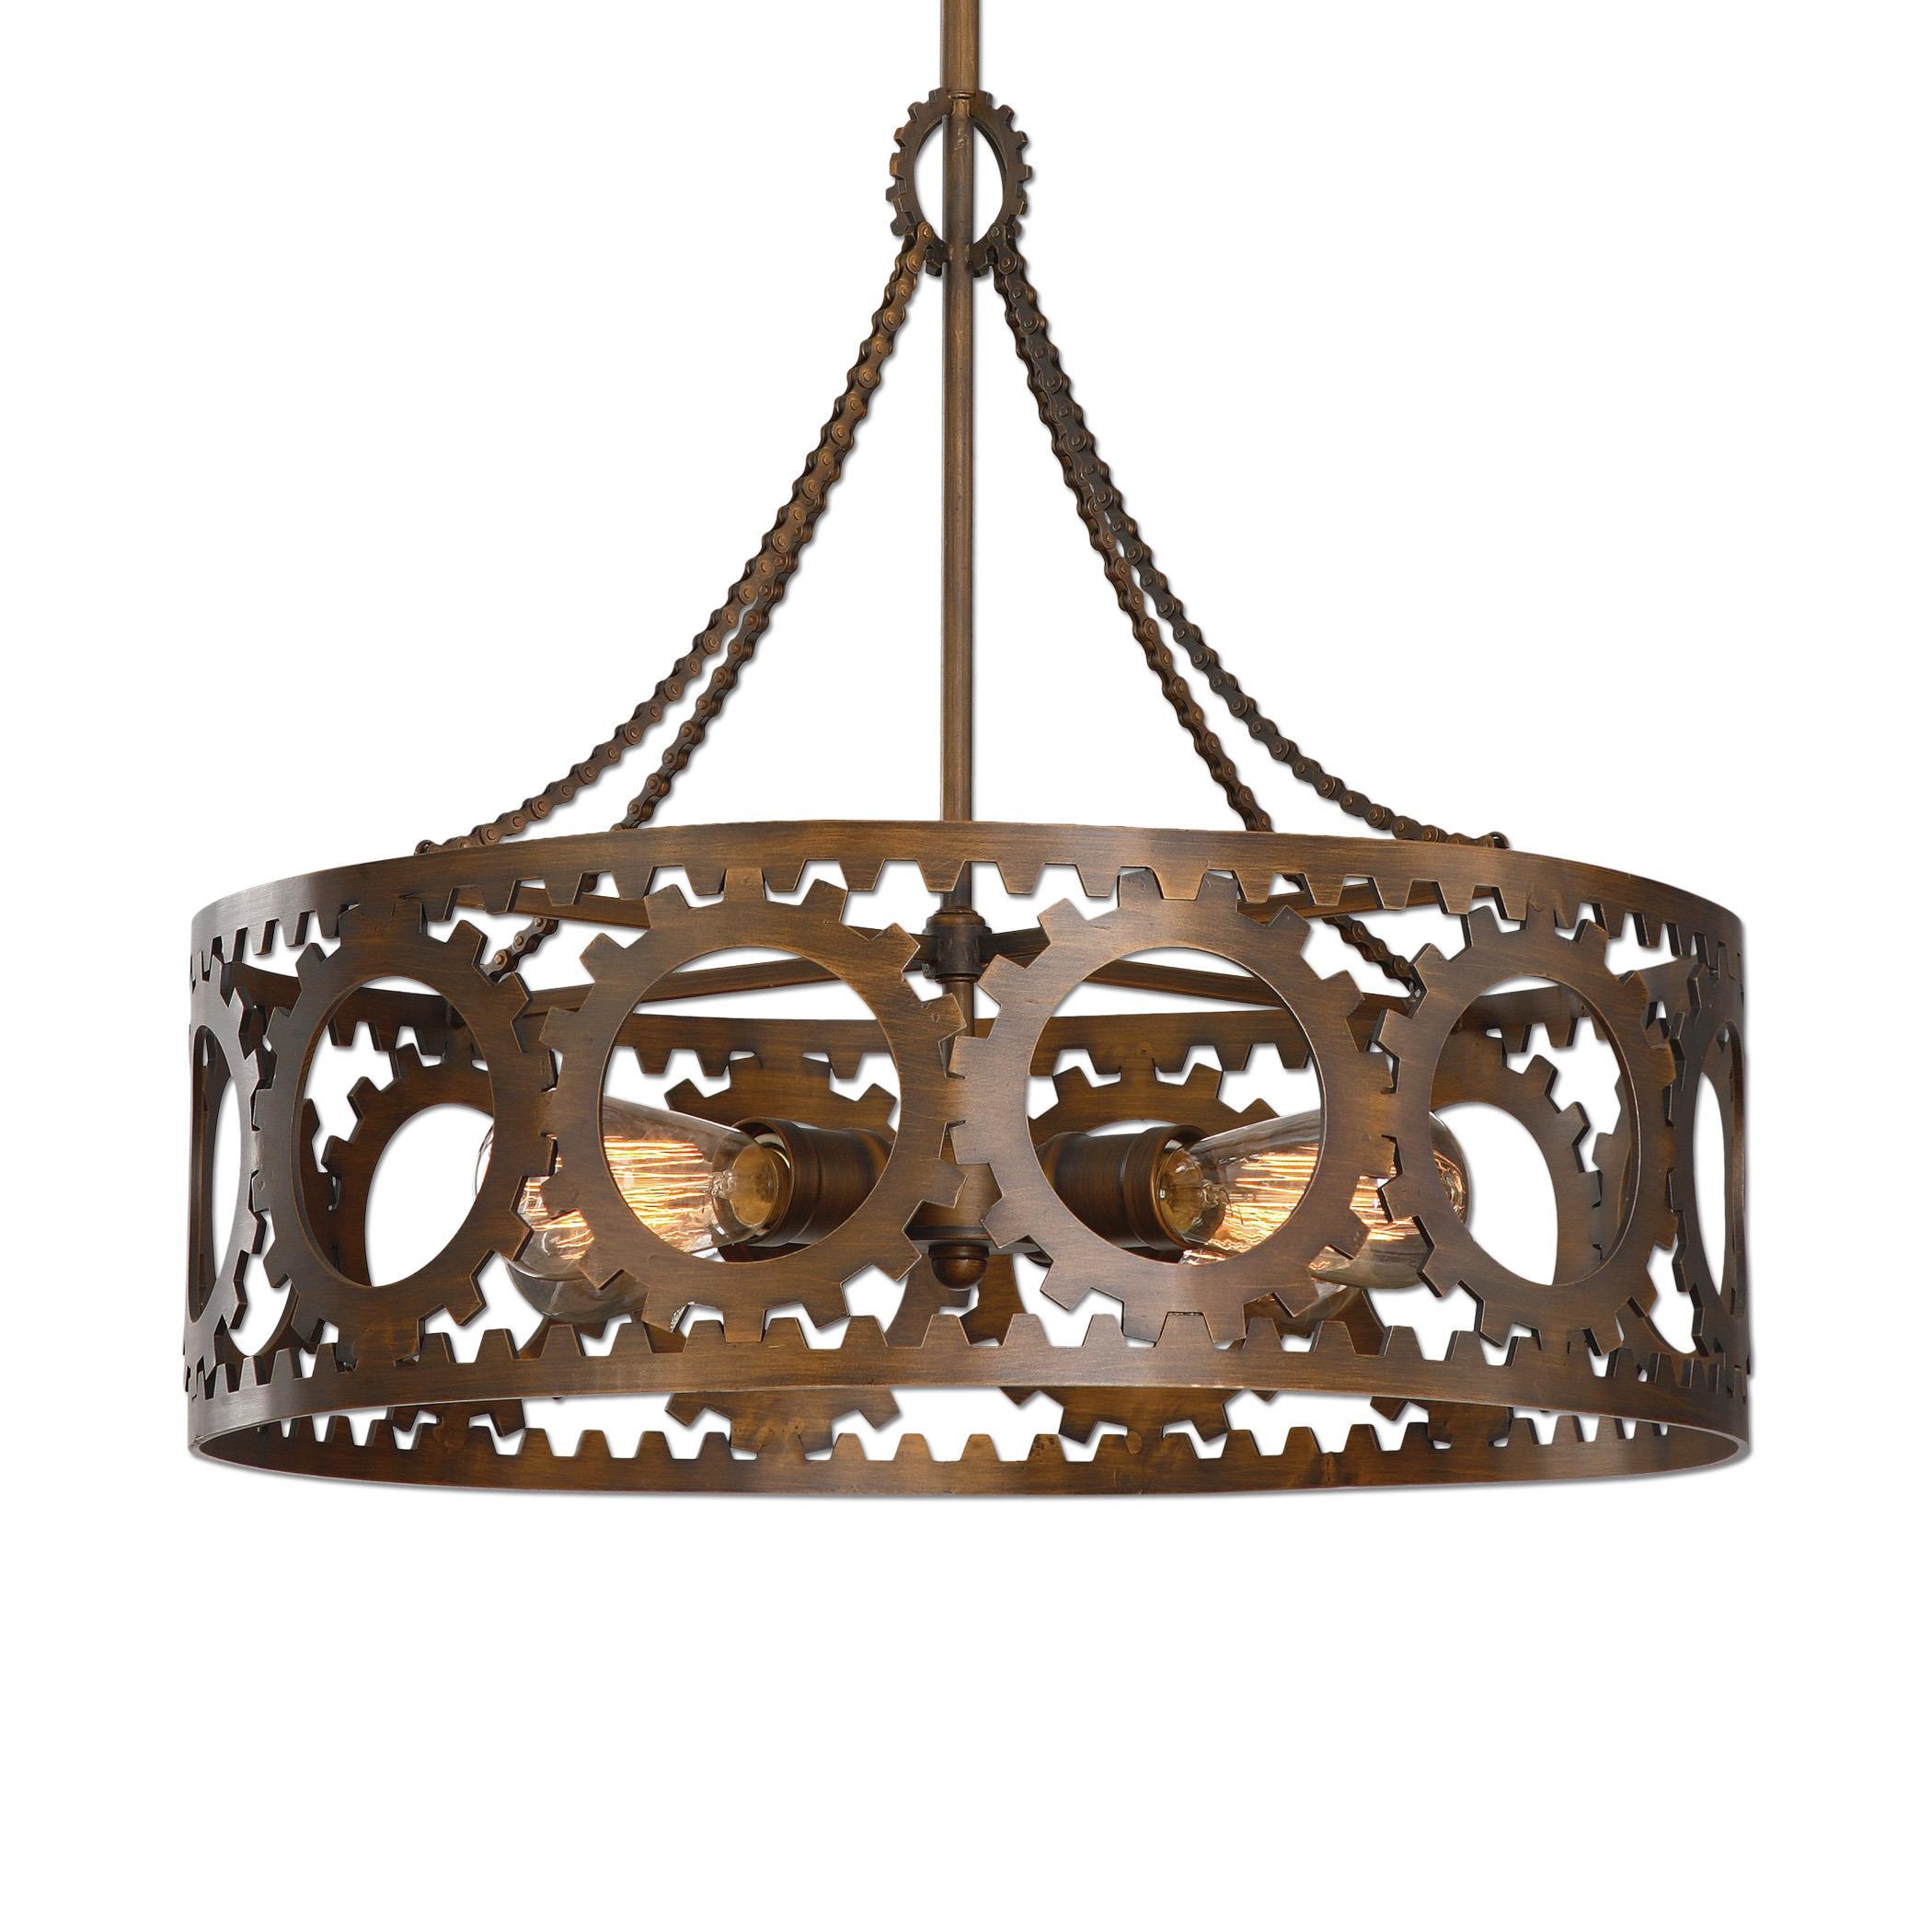 Uttermost Lighting Fixtures Antrim 4 Light Bronze Drum Pendant - Item Number: 22060